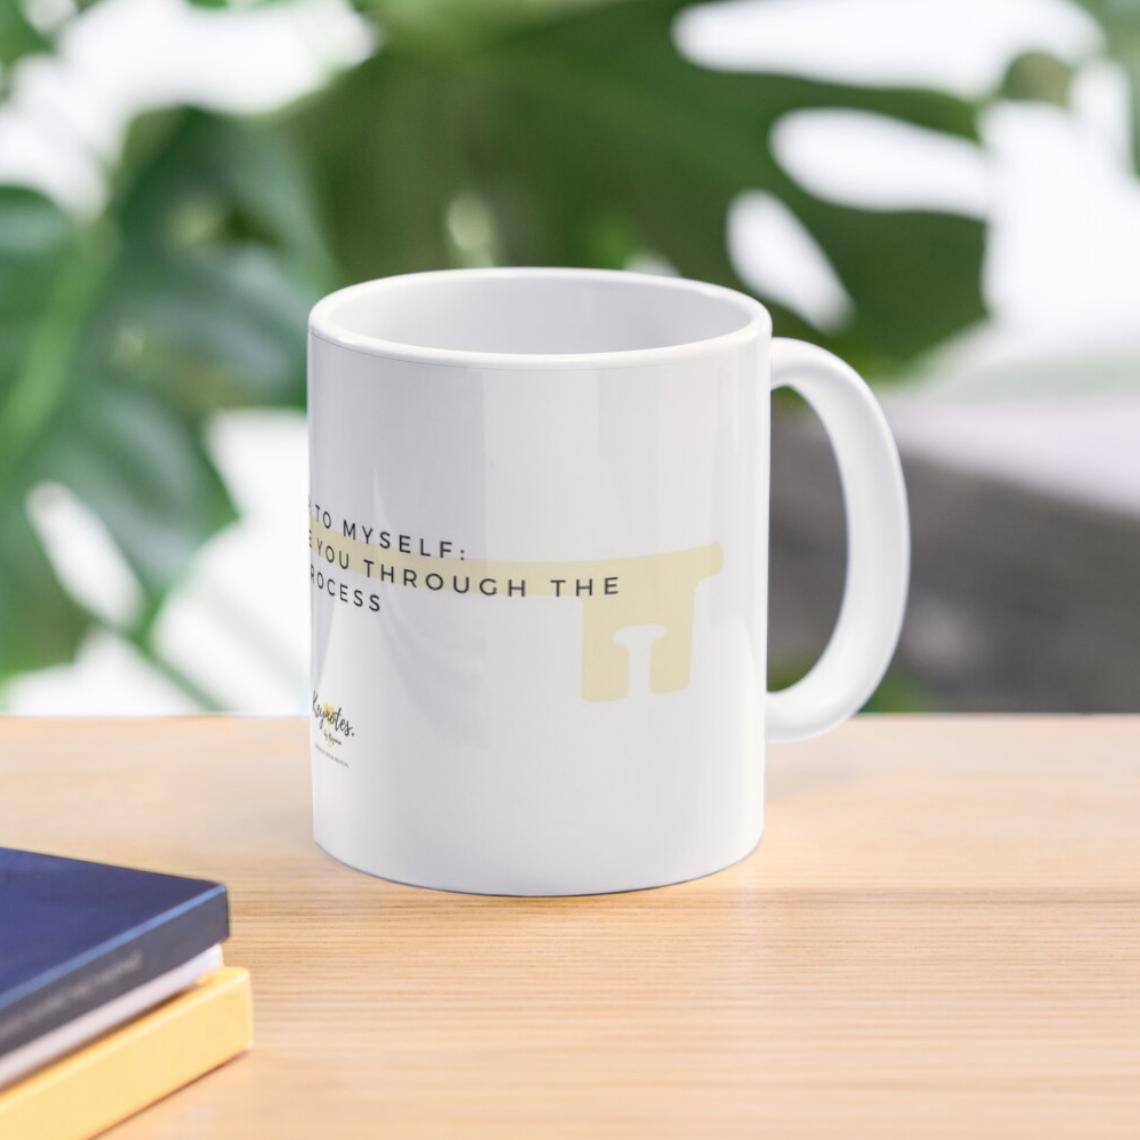 KEYNOTES: LETTER TO MYSELF Mug